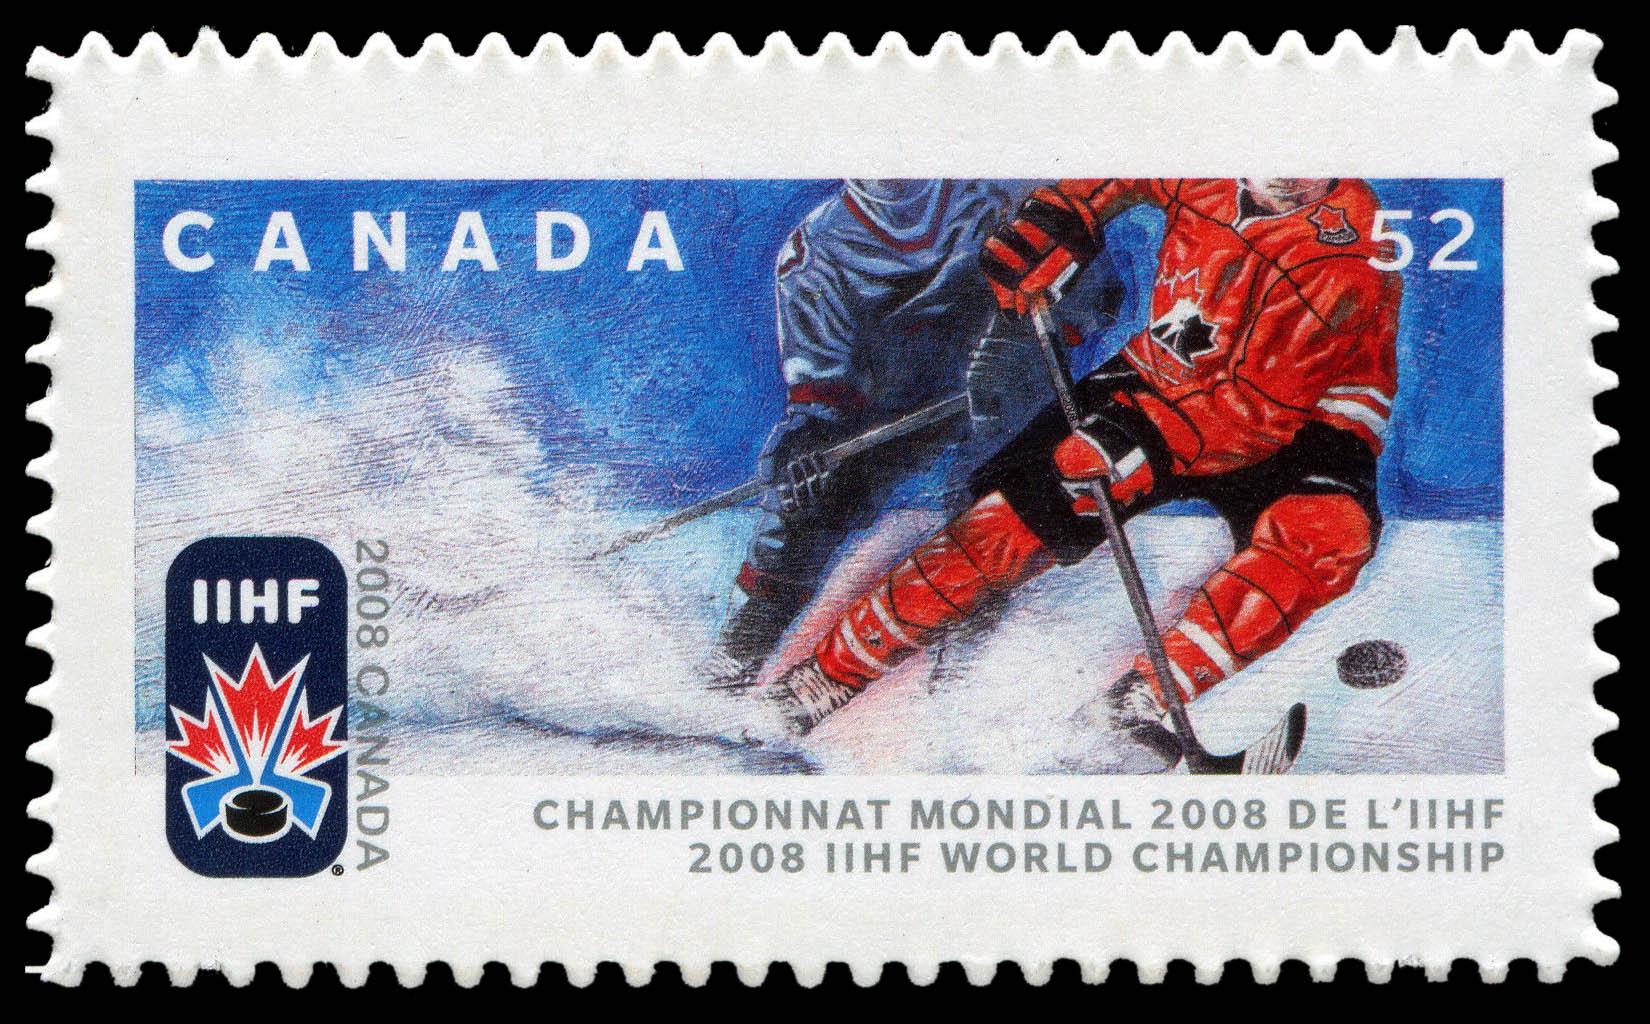 2008 IIHF World Championship Canada Postage Stamp